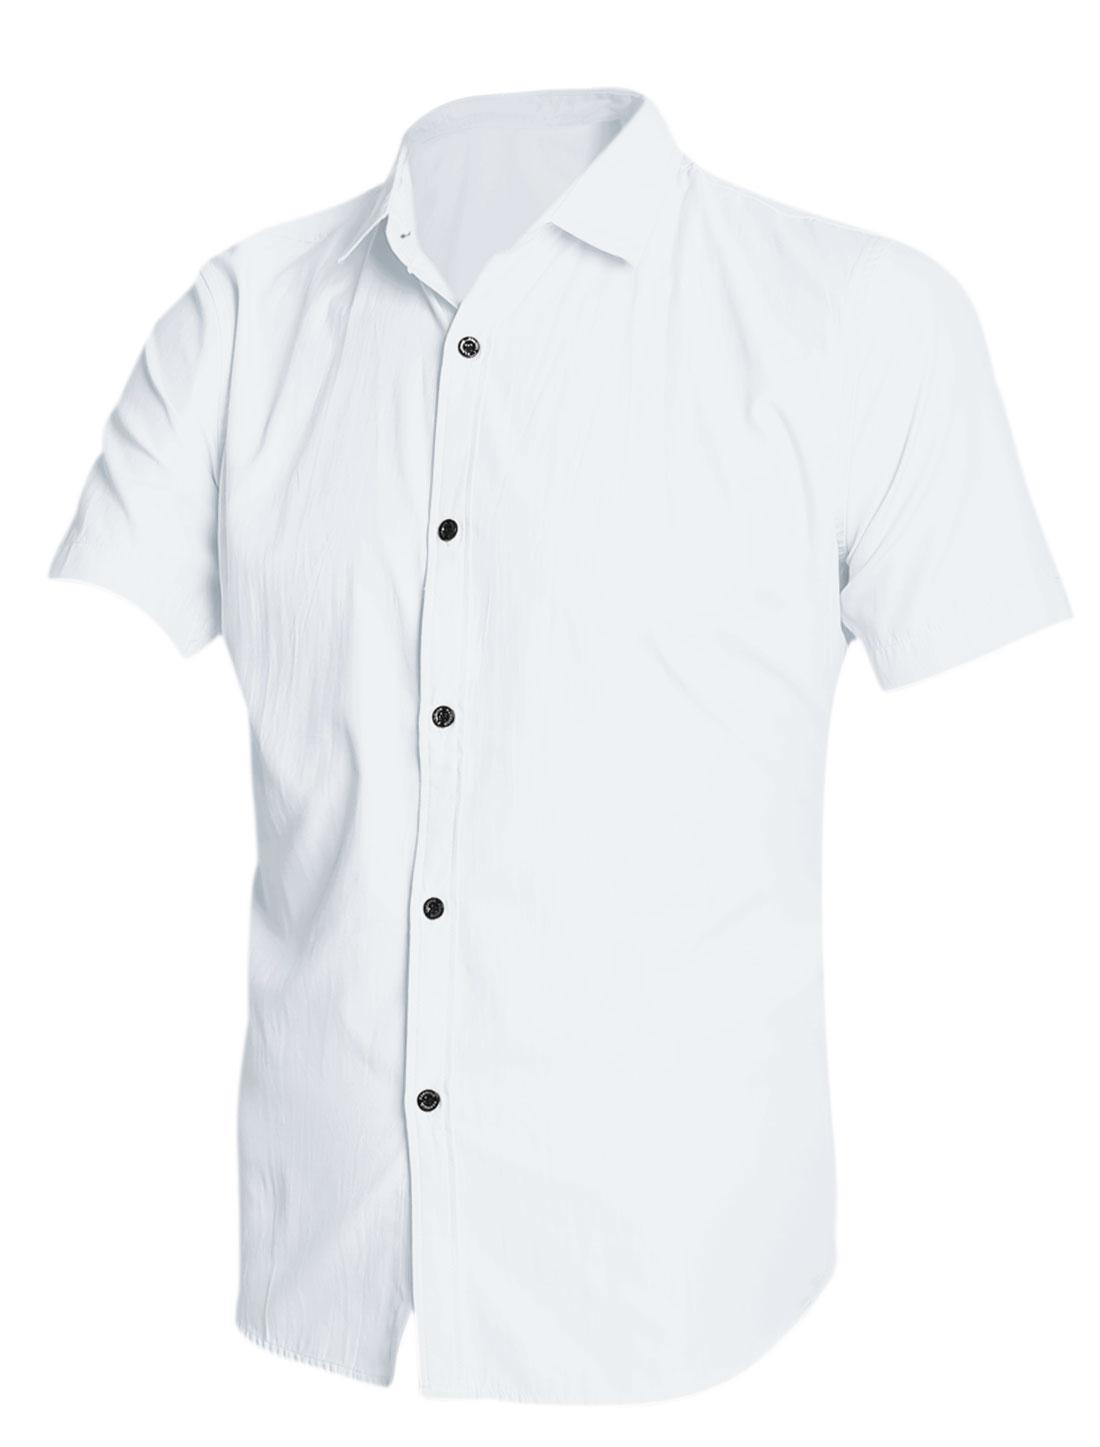 Men Point Collar Short Sleeves Button Down Shirt White M